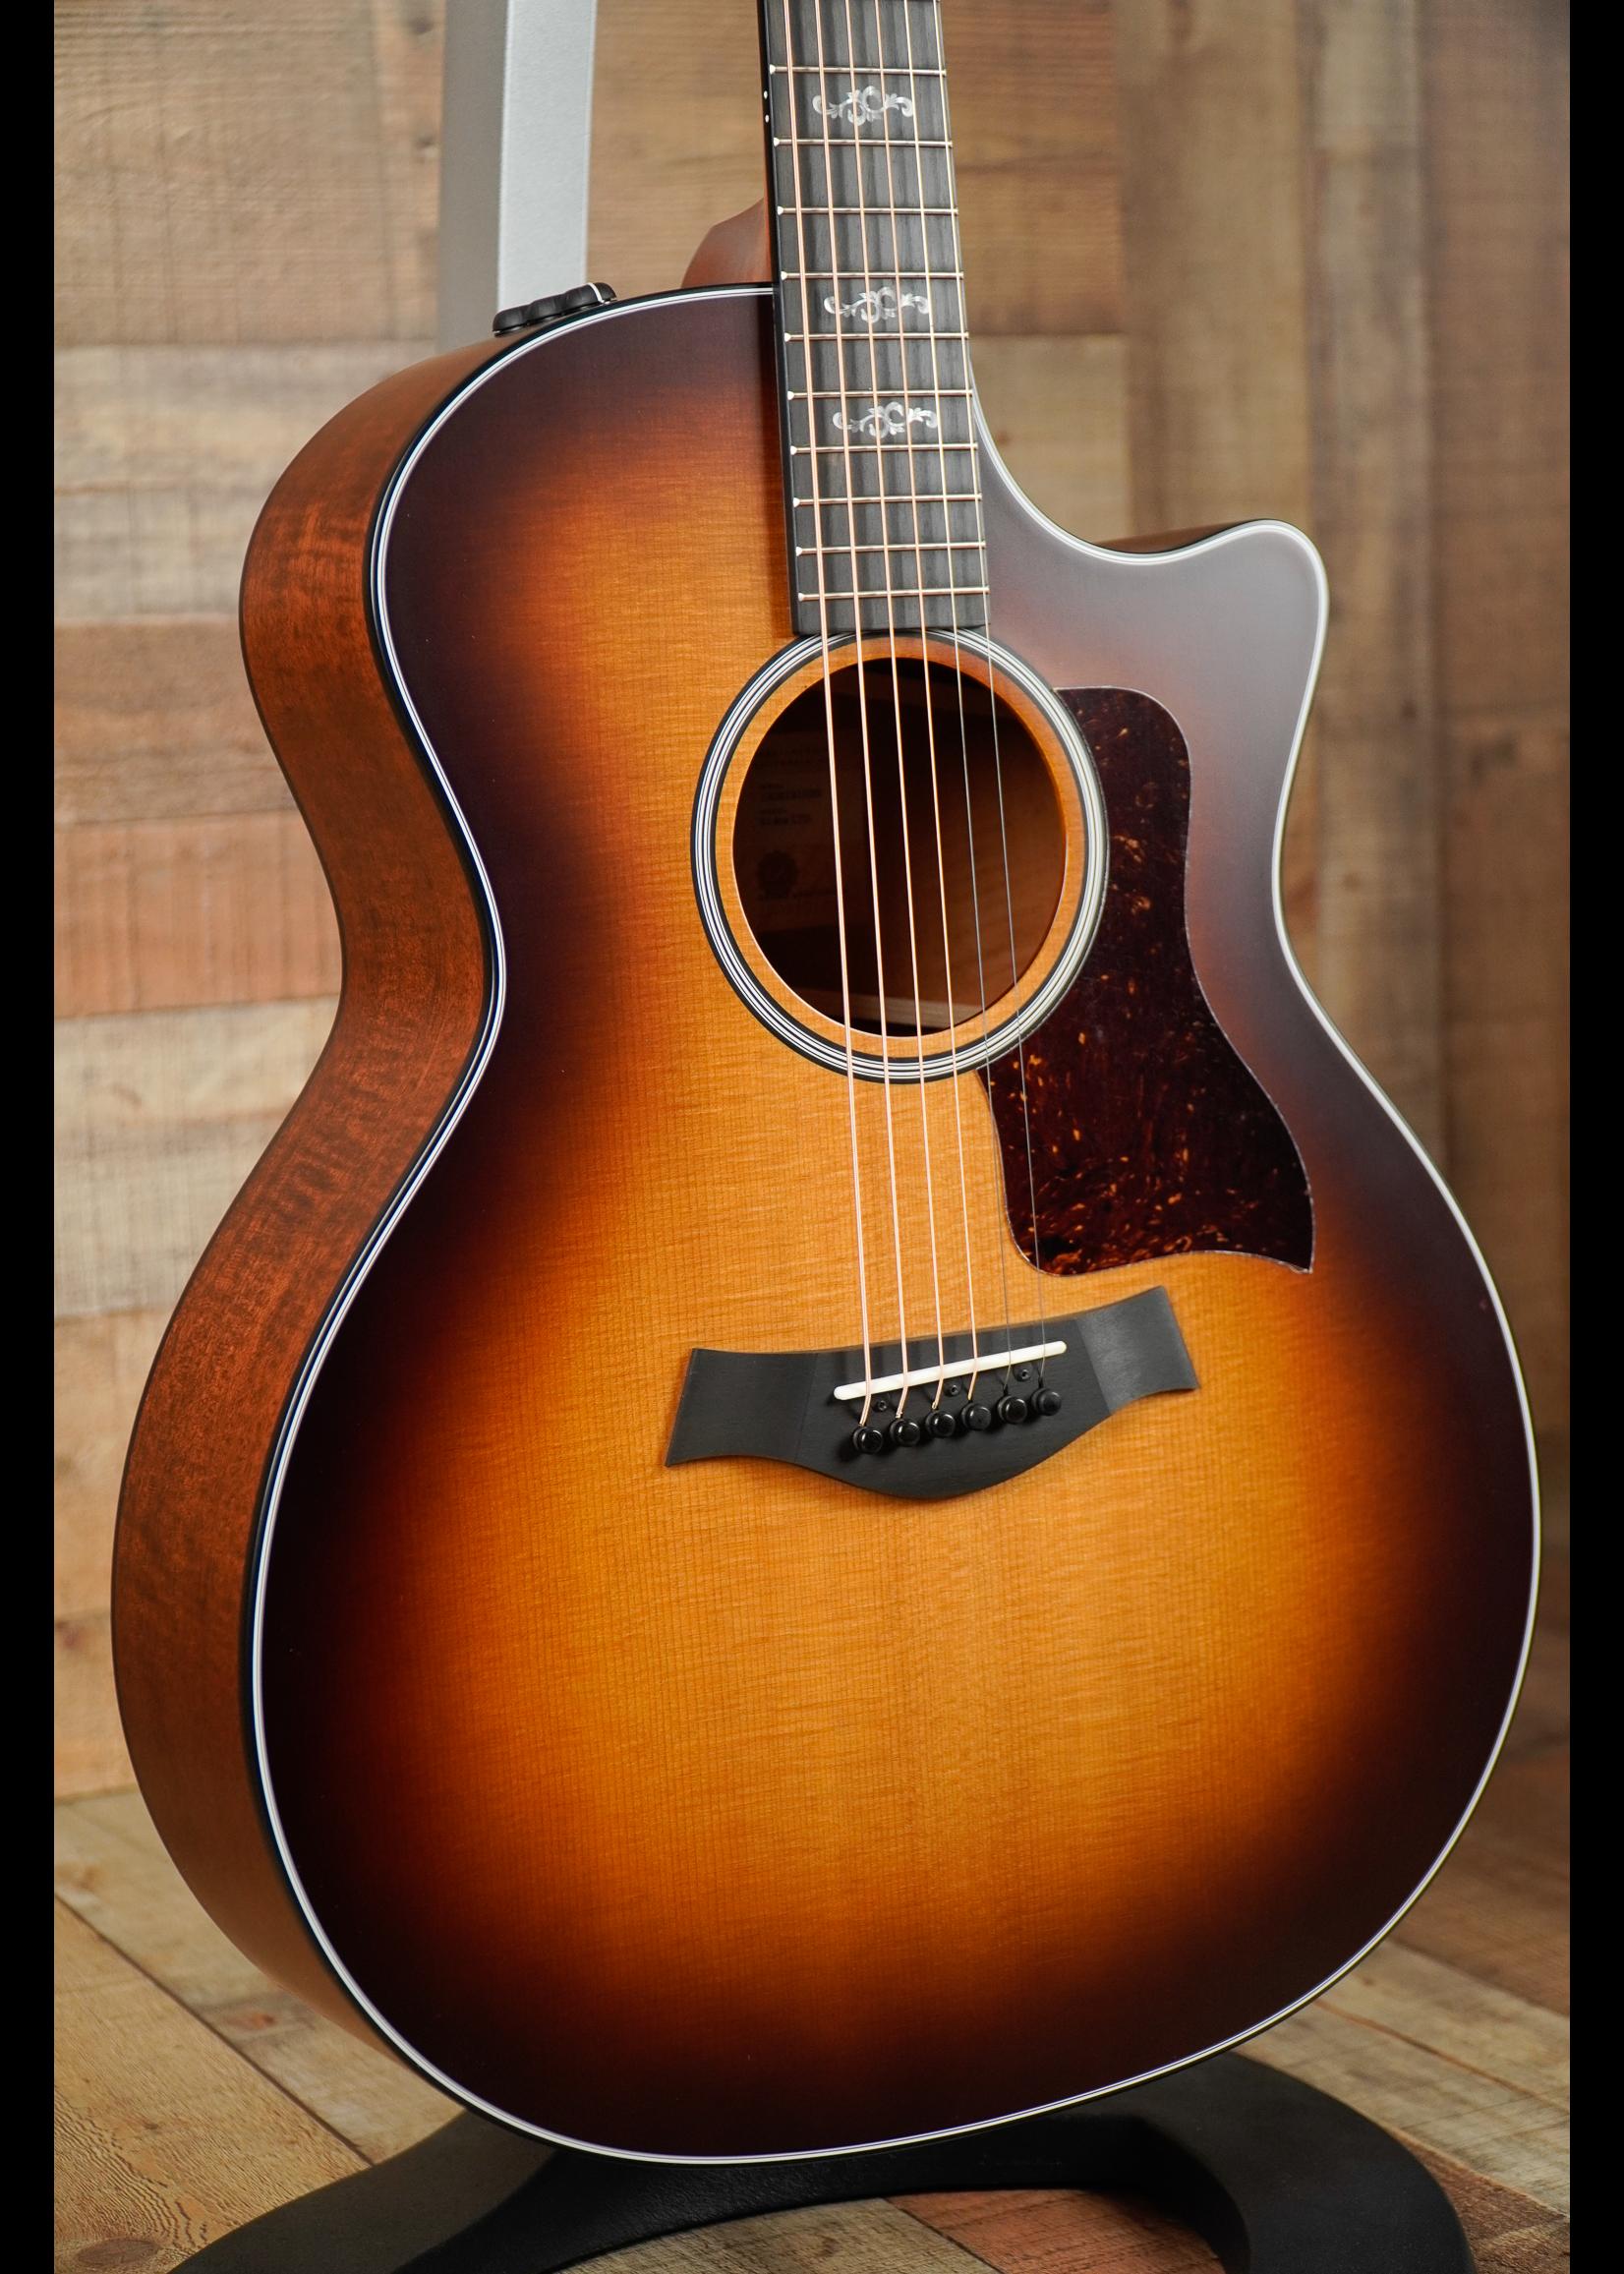 Taylor Taylor 314CE Torrefied Spruce, Figured Mahogany Back & Sides LTD 3 Tone Sunburst